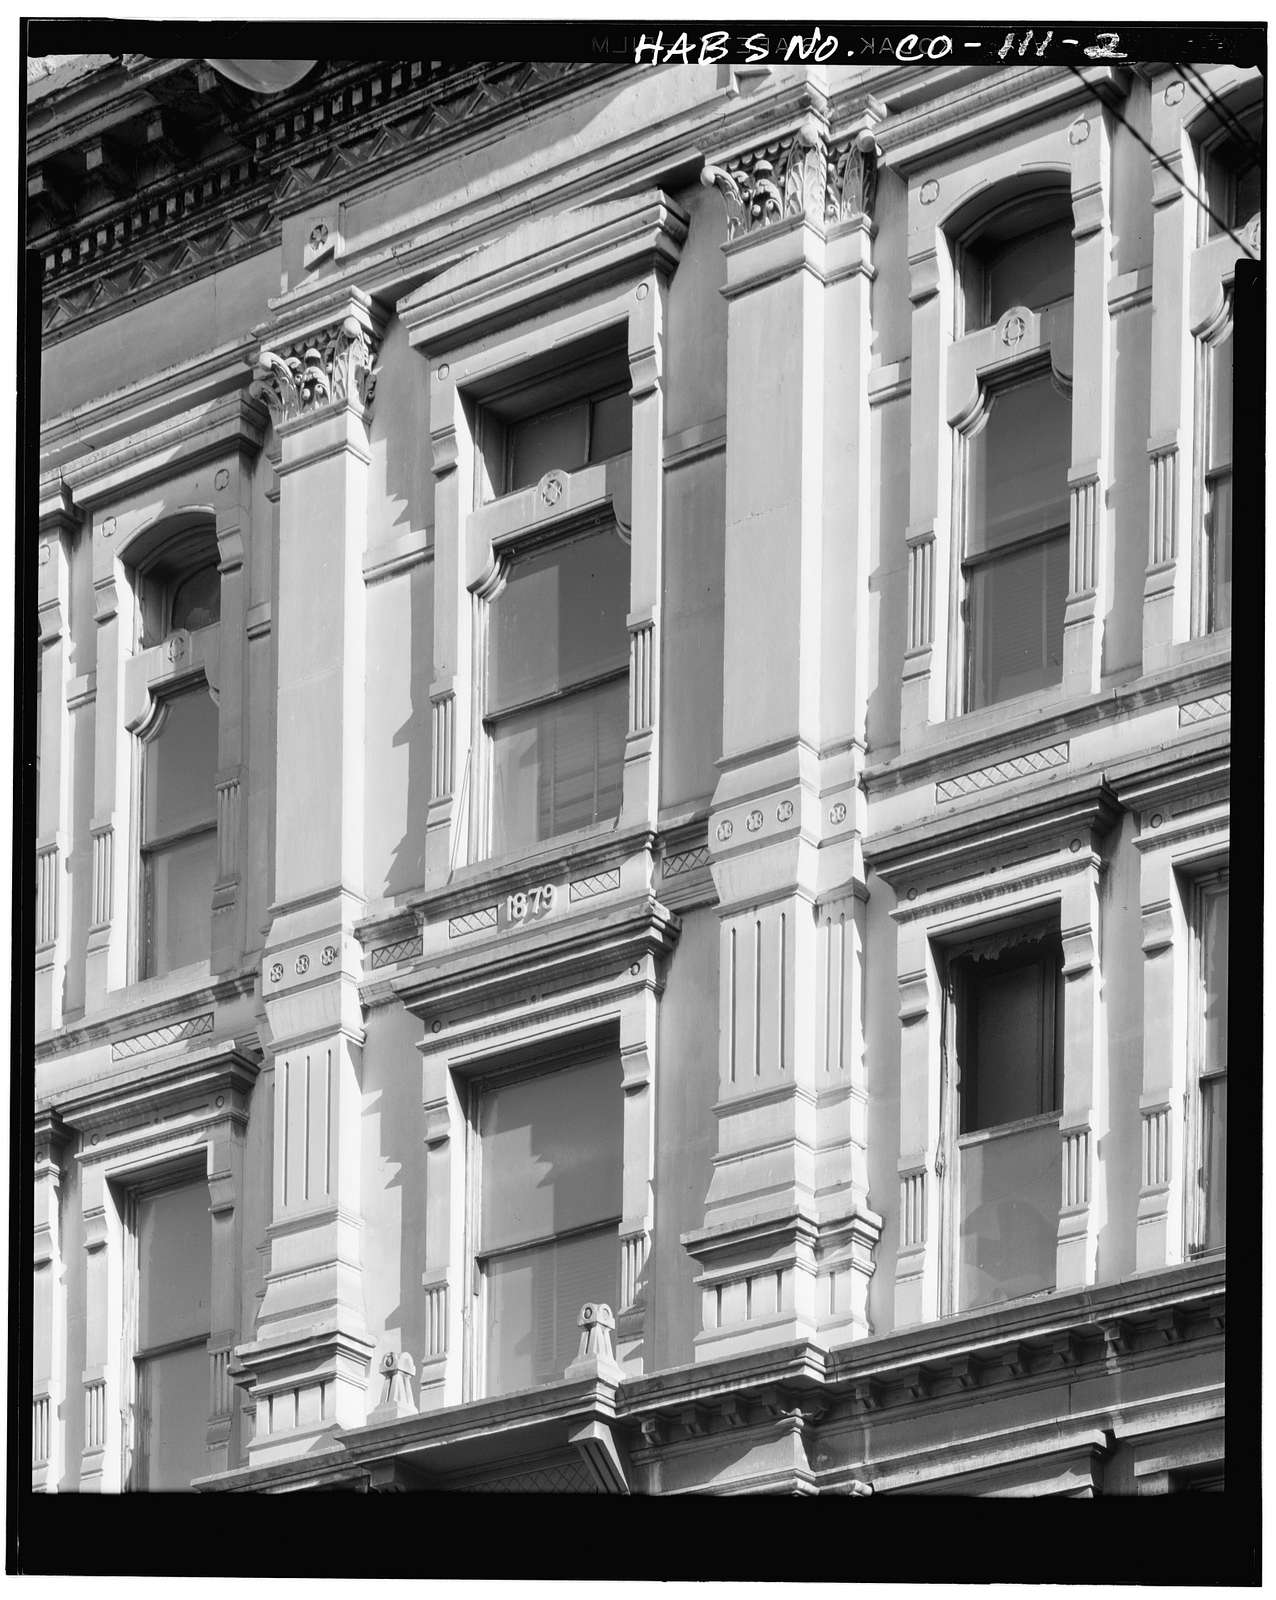 H.A.W. Tabor Block, Larimer & Sixteenth Streets, Denver, Denver County, CO